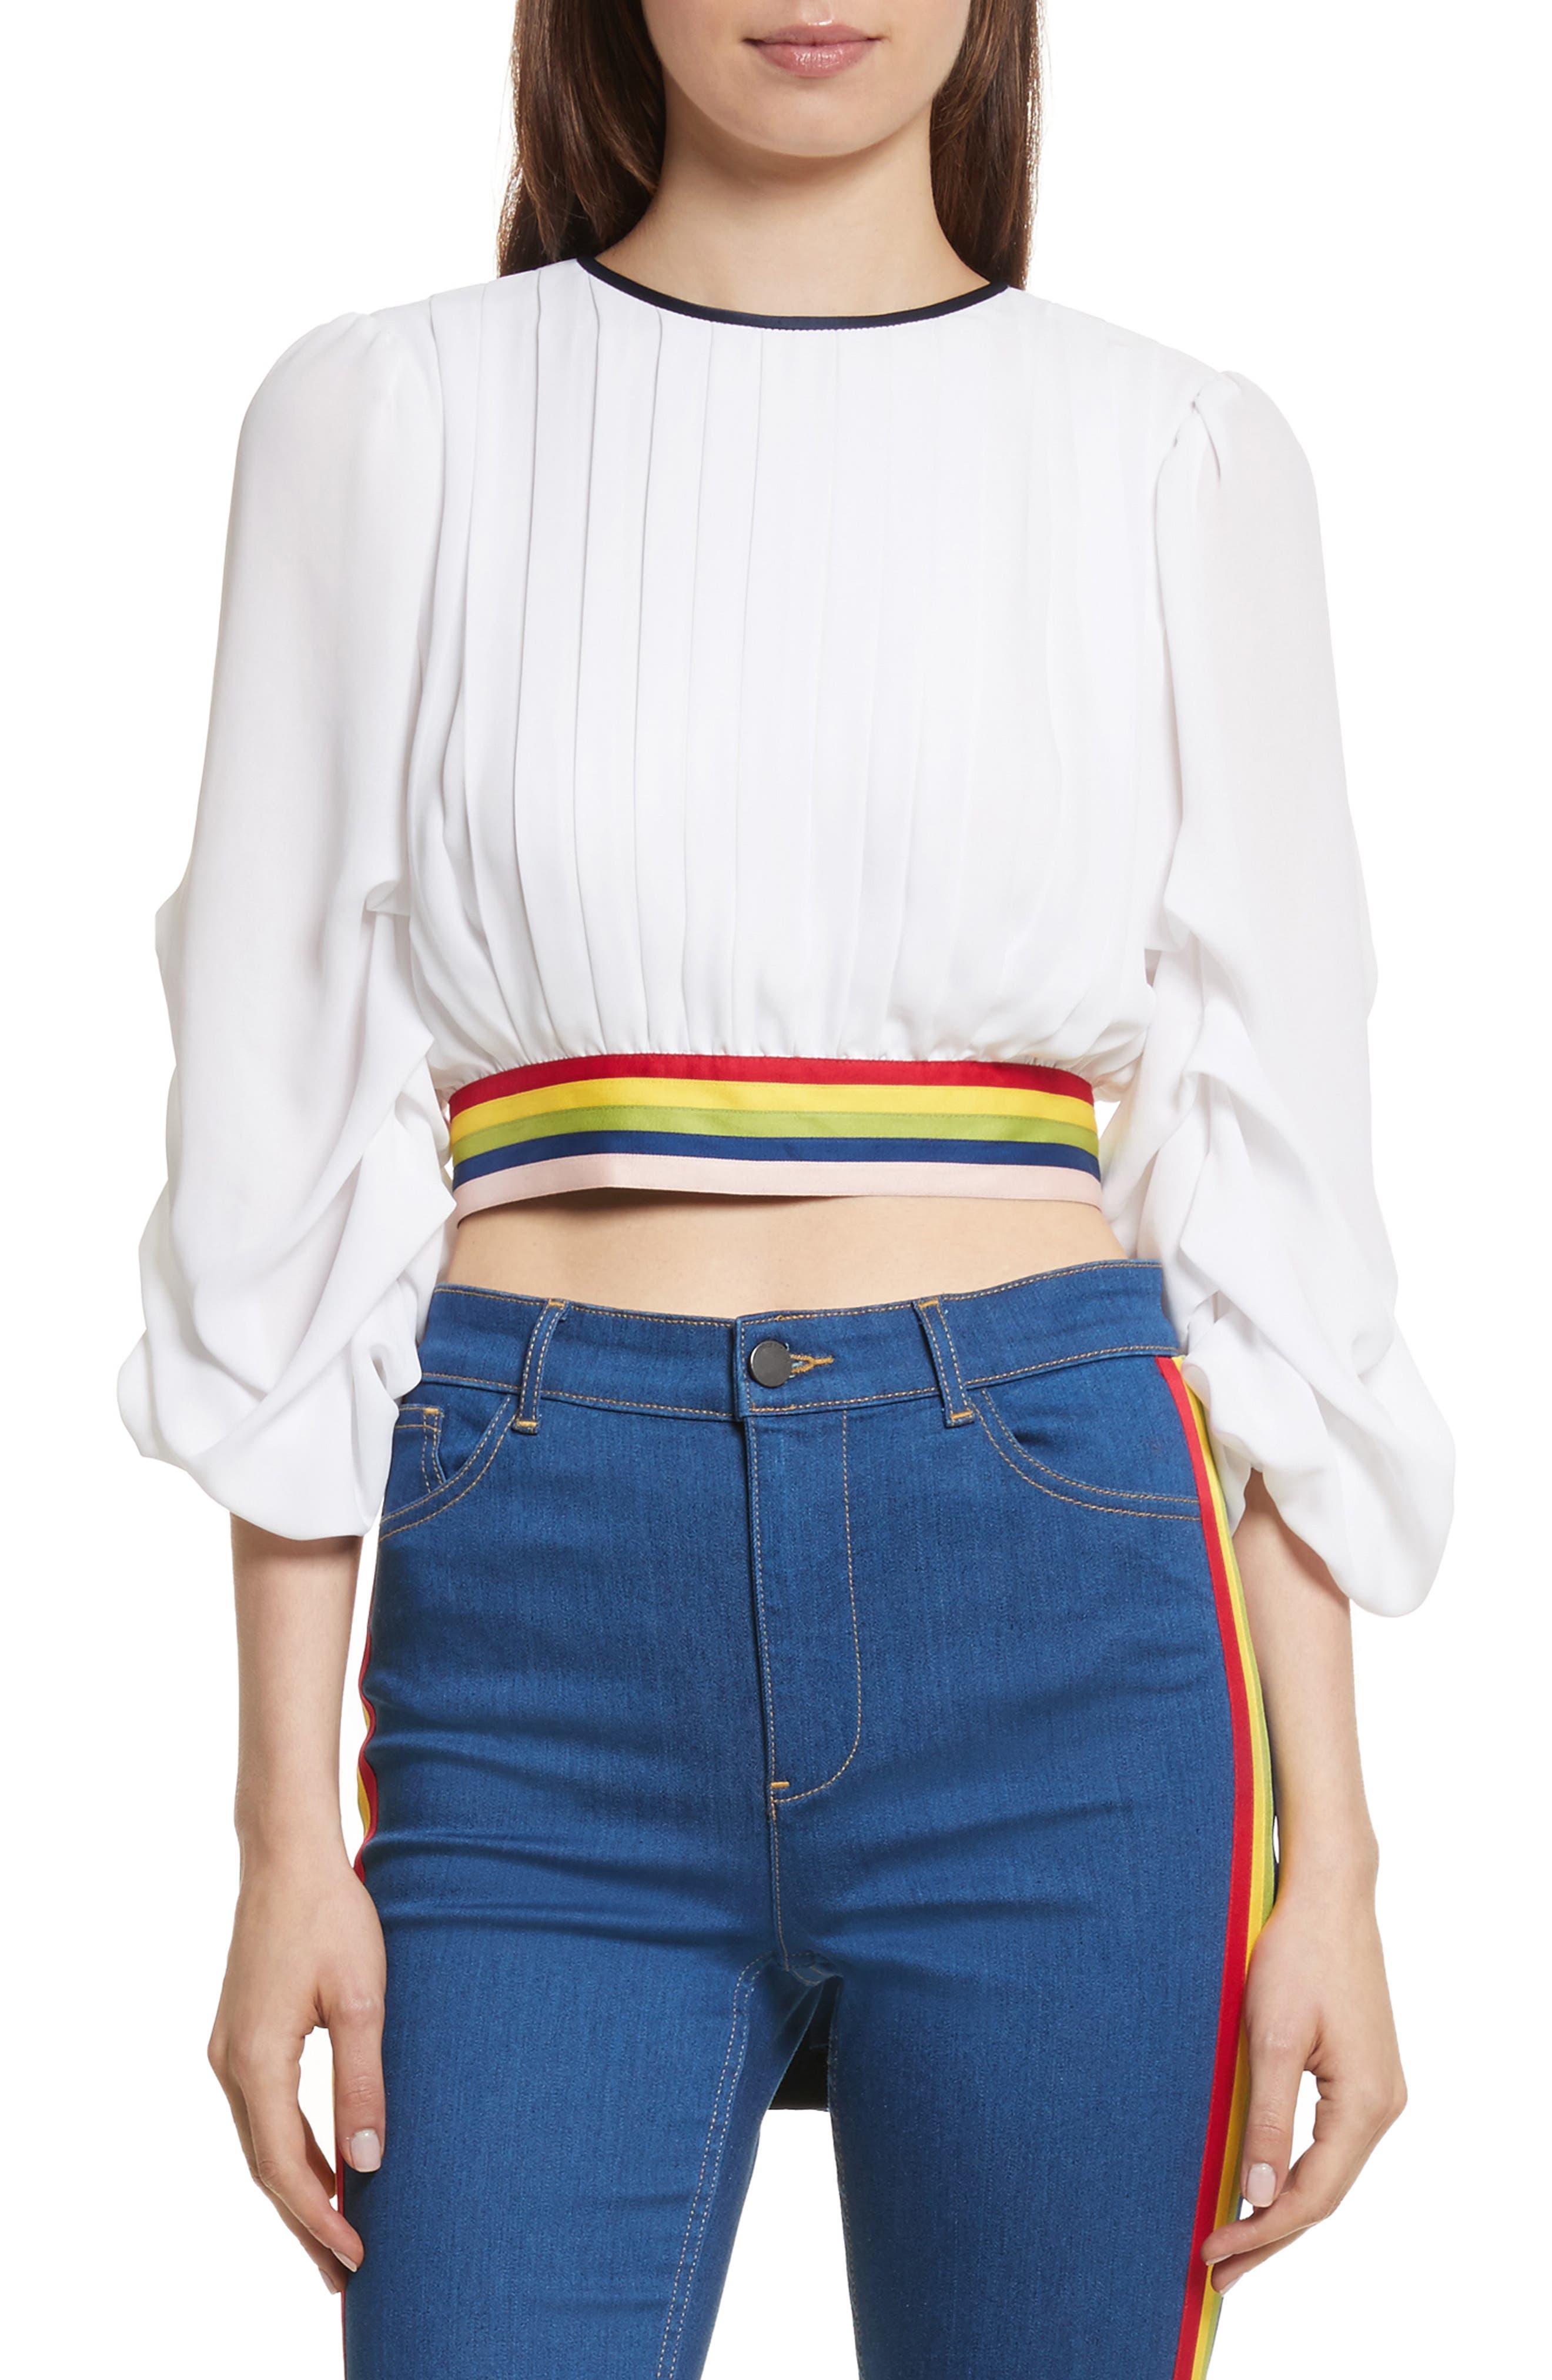 Dakota Tack Sleeve Top,                         Main,                         color, White/ Multi